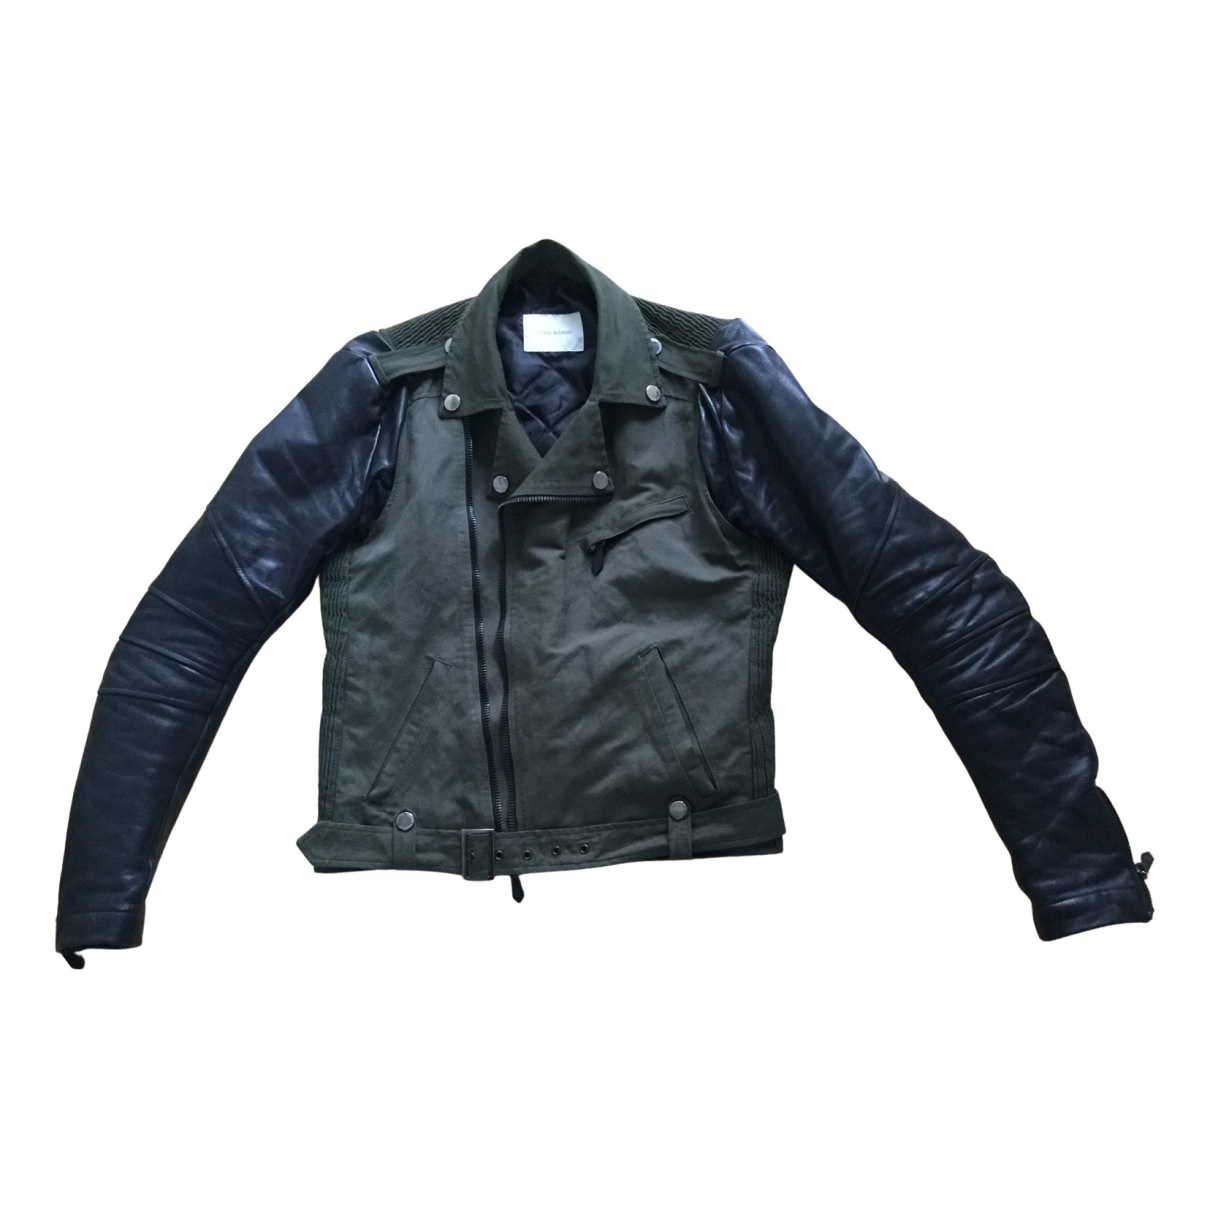 Pierre Balmain N Khaki Leather jacket  for Men 48 FR